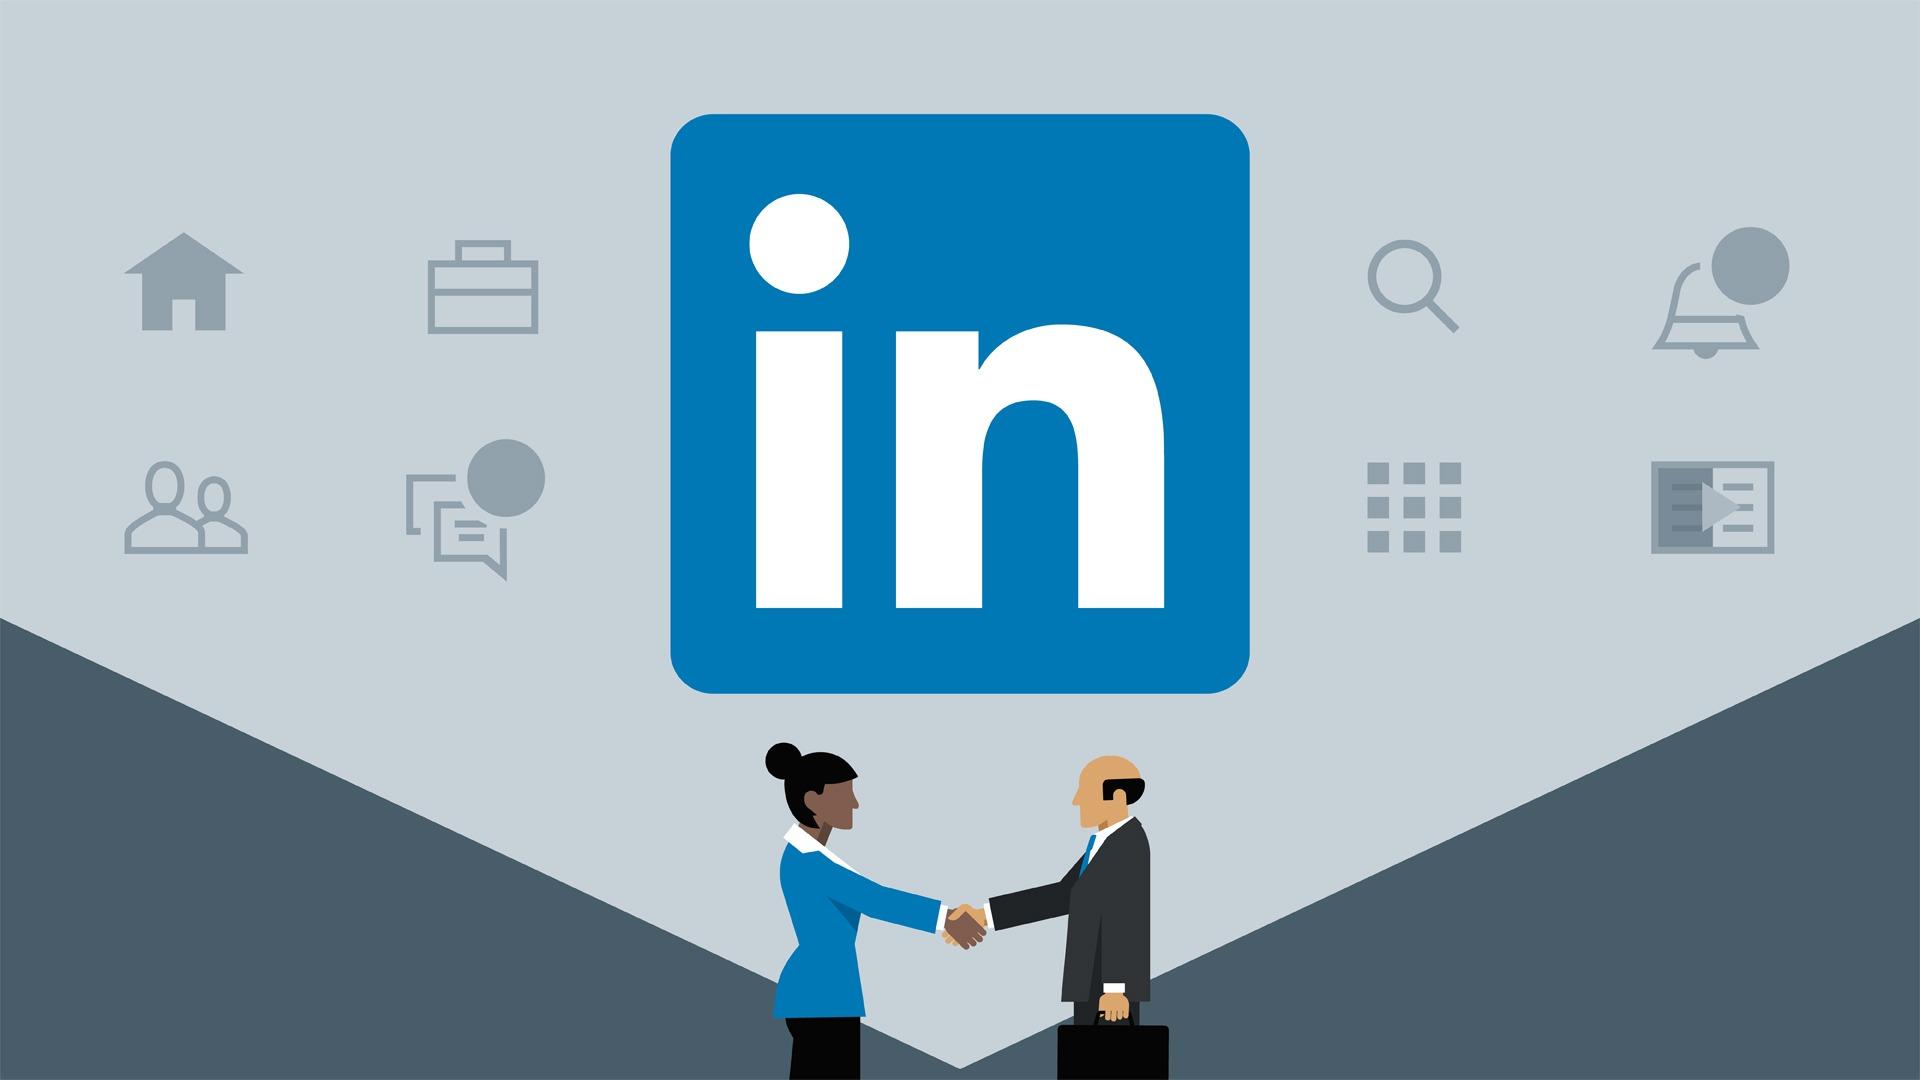 Pautas para potenciar el perfil de marca en linkedin